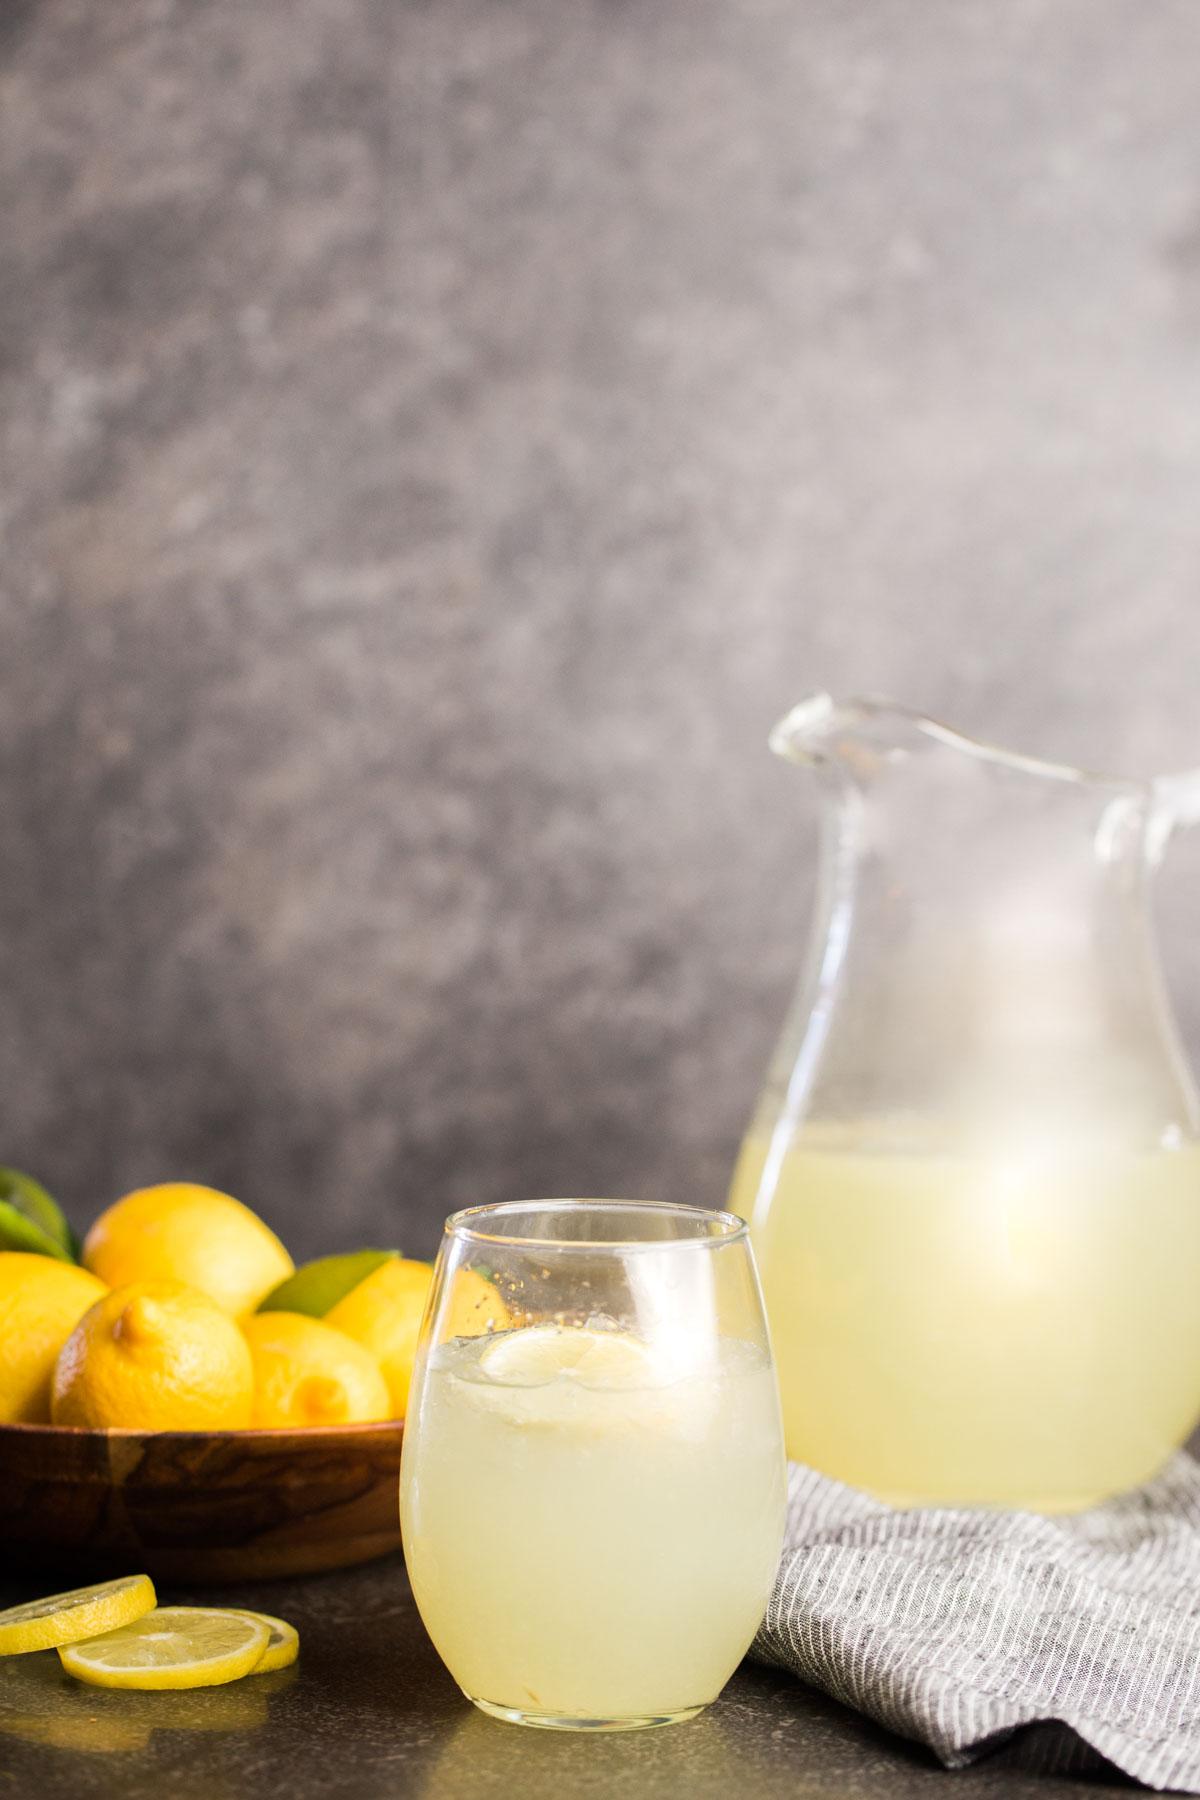 Lemonade in glass pitcher with bowl of lemons and glass of lemonade.